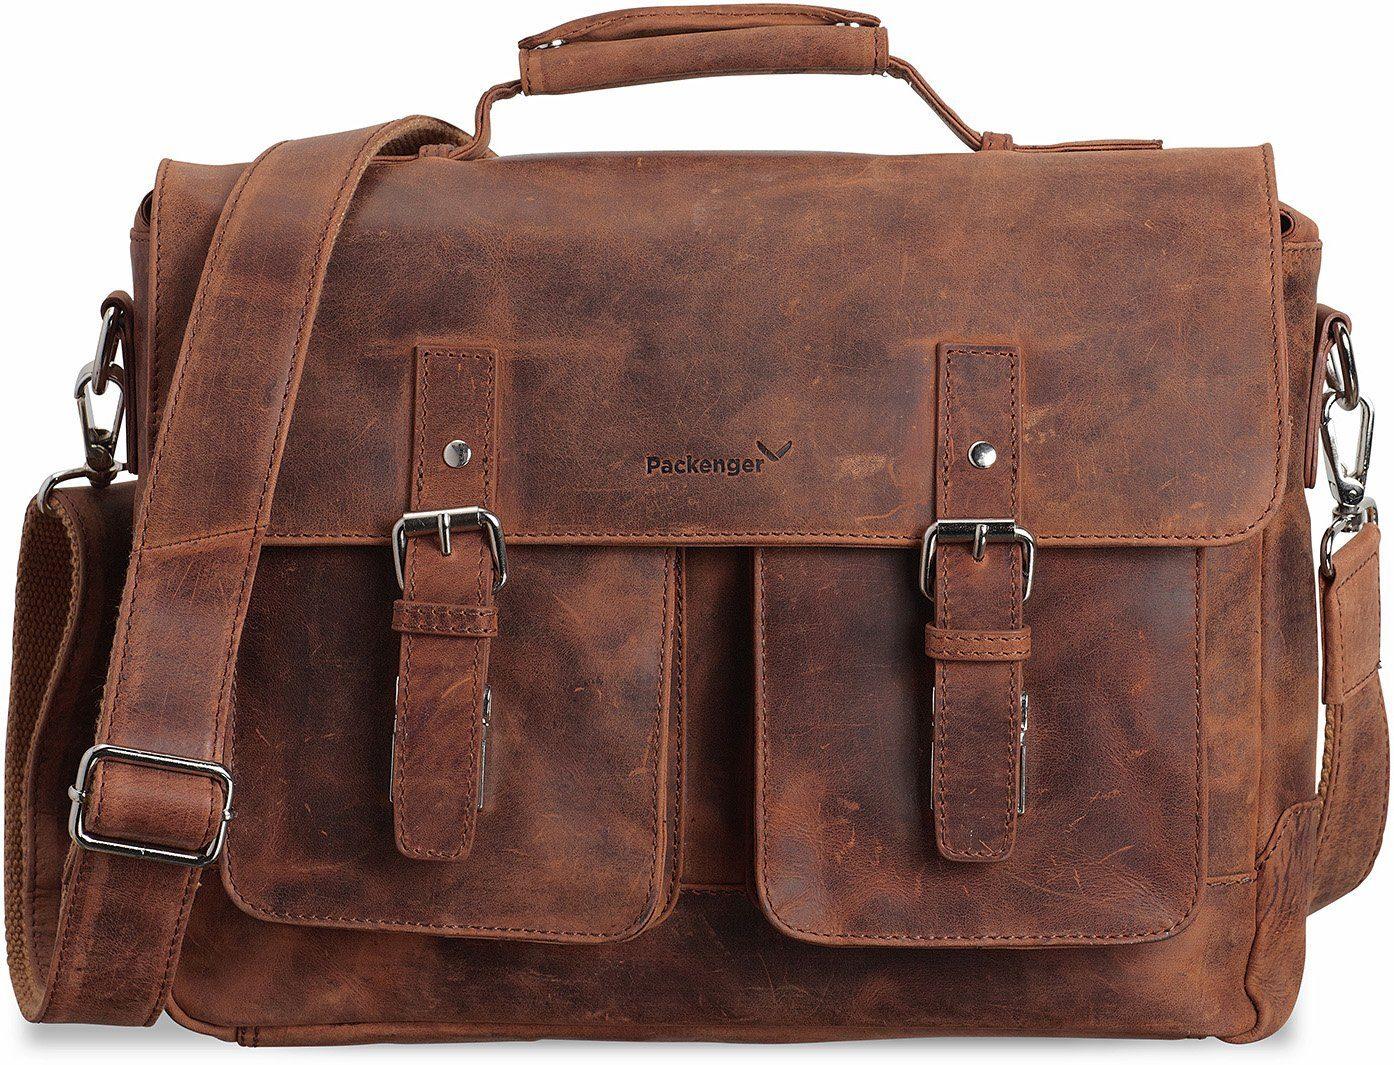 Mit »kolbjorn Cognac« zoll Laptopfach 15 Umhängetasche Packenger fOxq15vw